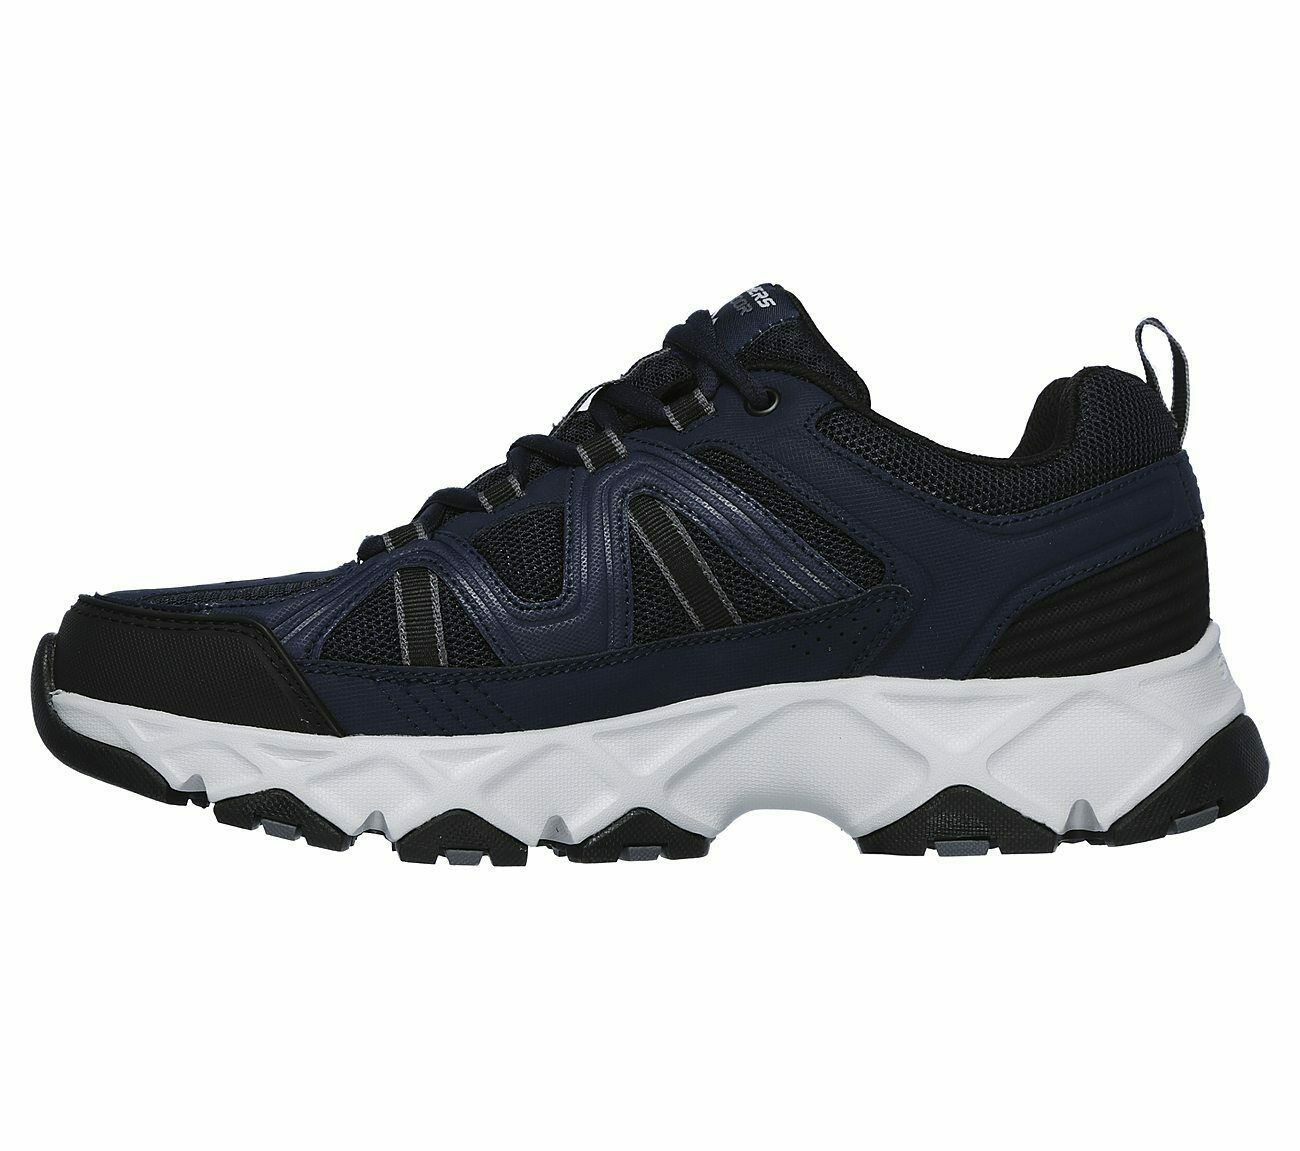 Skechers Navy Black Extra Wide Fit Shoe Men Memory Foam Sport Comfort Soft 51885 image 3